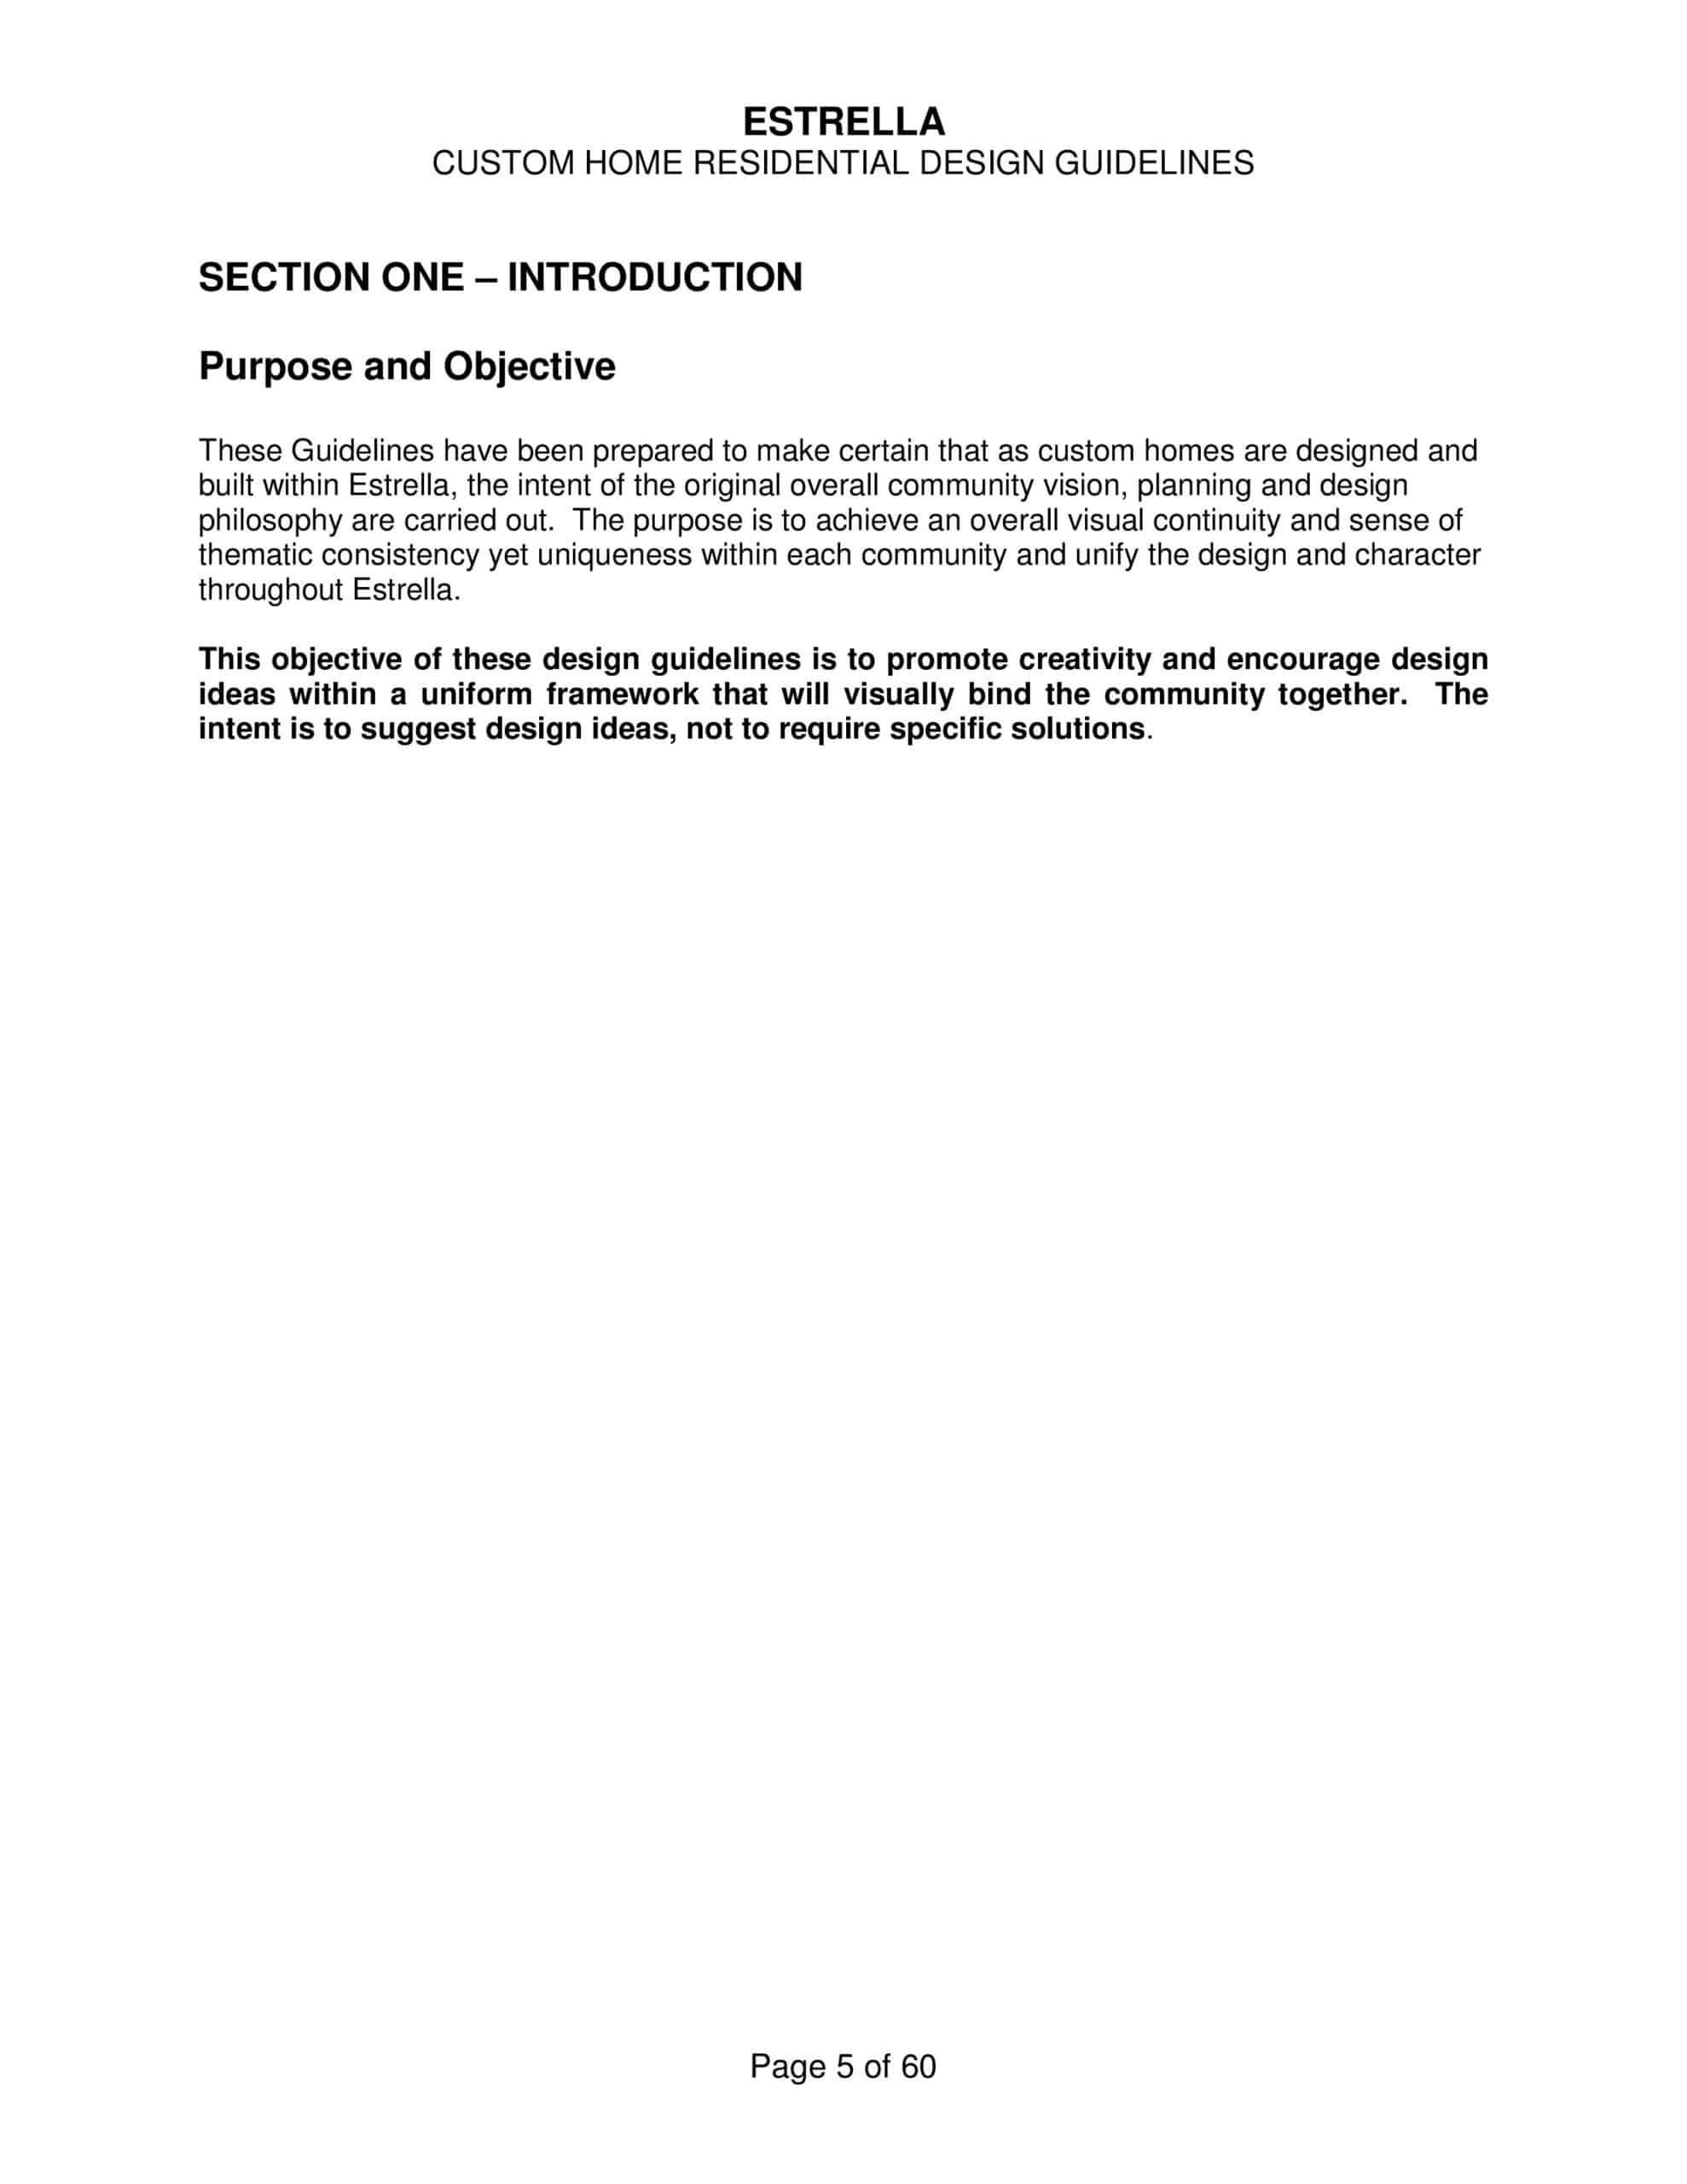 ESTRELLA MOUNTAIN CUSTOM HOME GUIDELINES-page-009